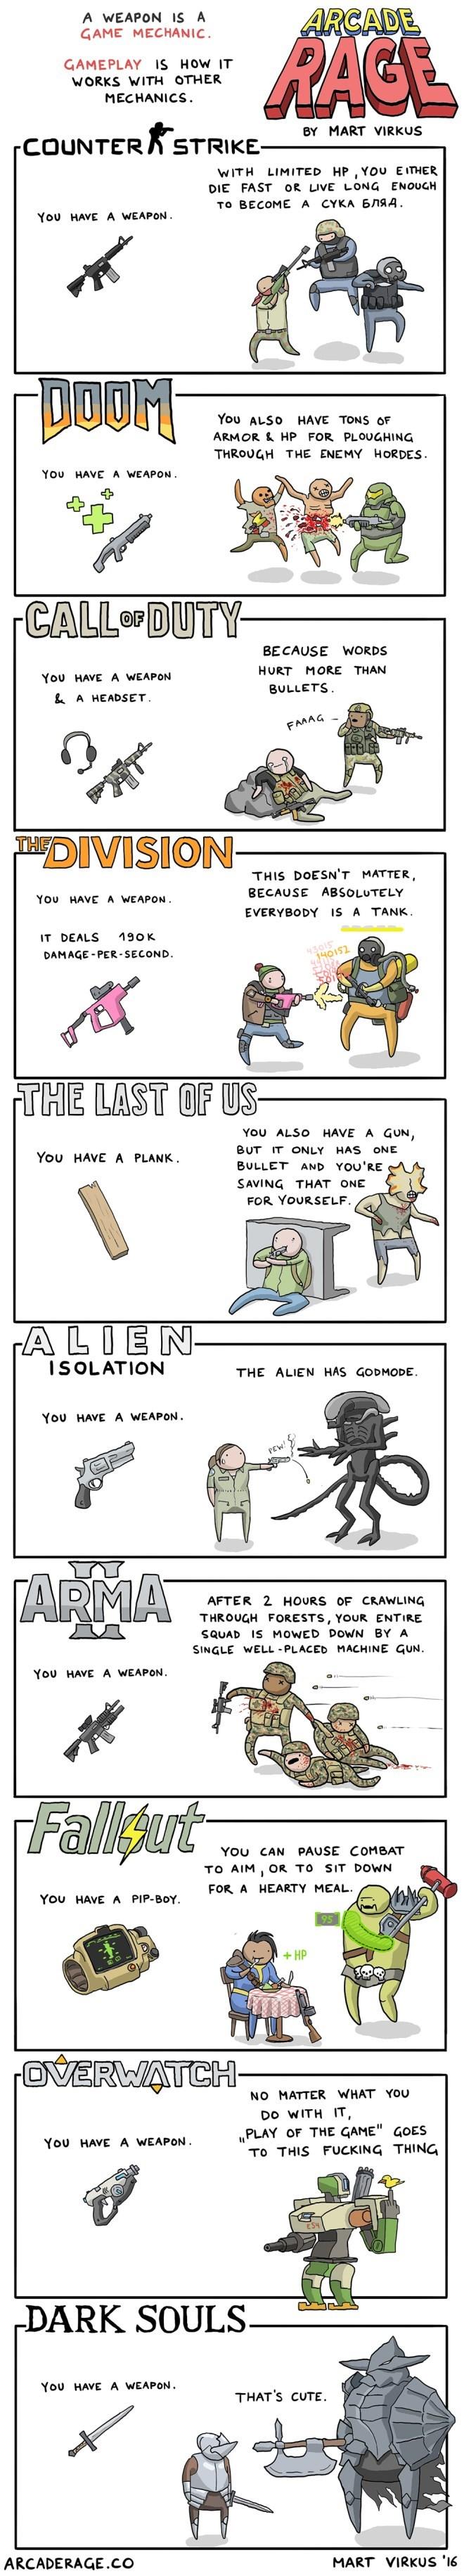 web-comics-perfectly-explain-different-video-gameplay-using-combat-mechanics